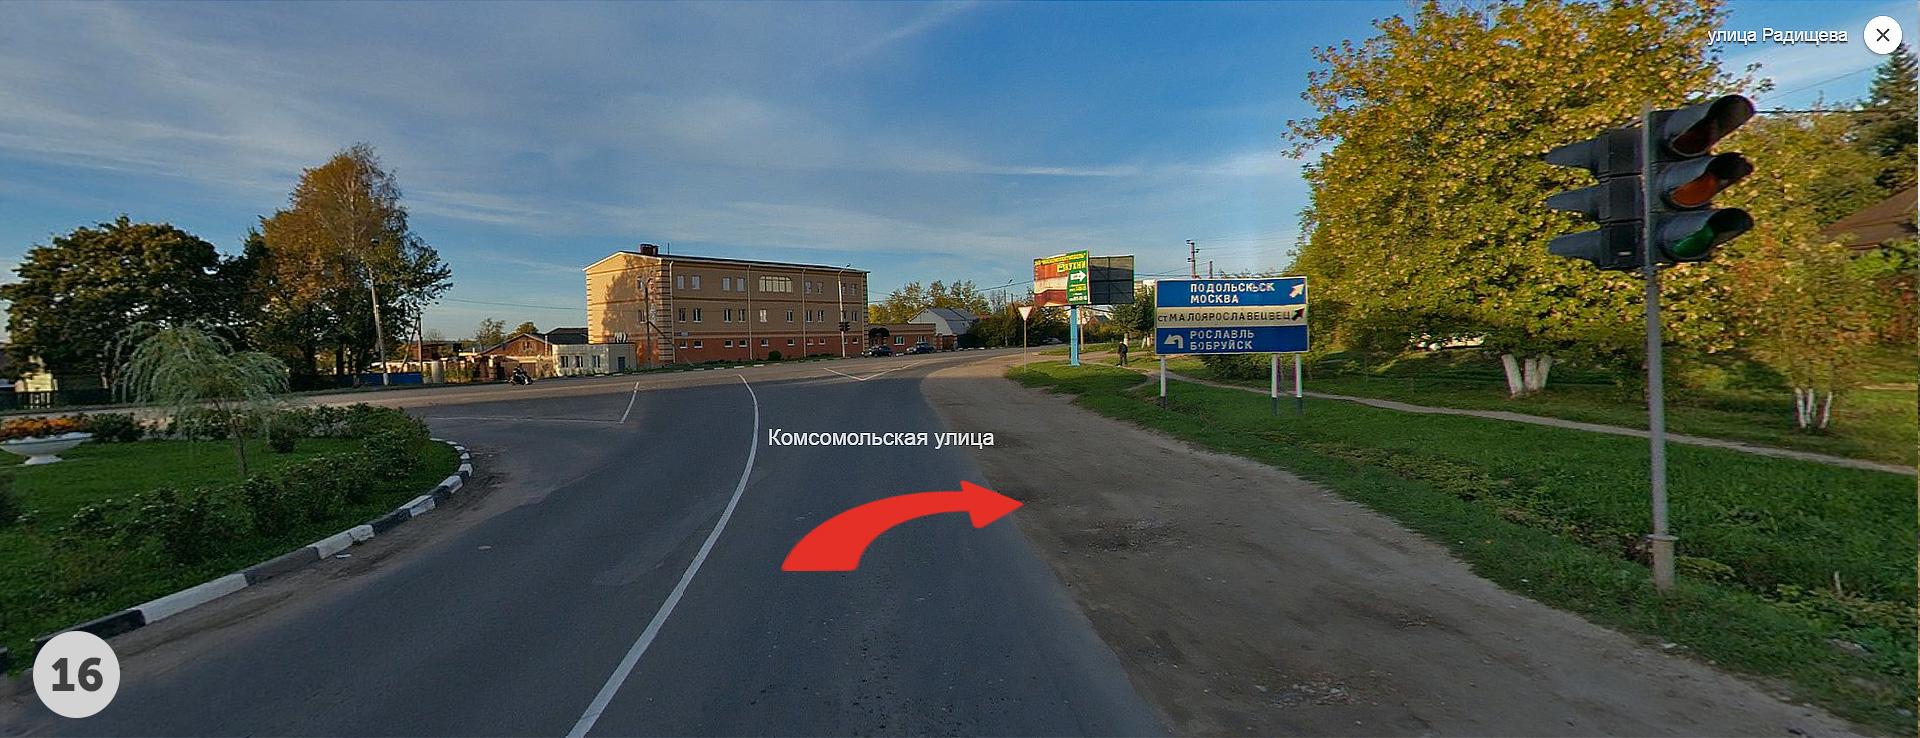 схема проезда вгород малоярославец из москвы